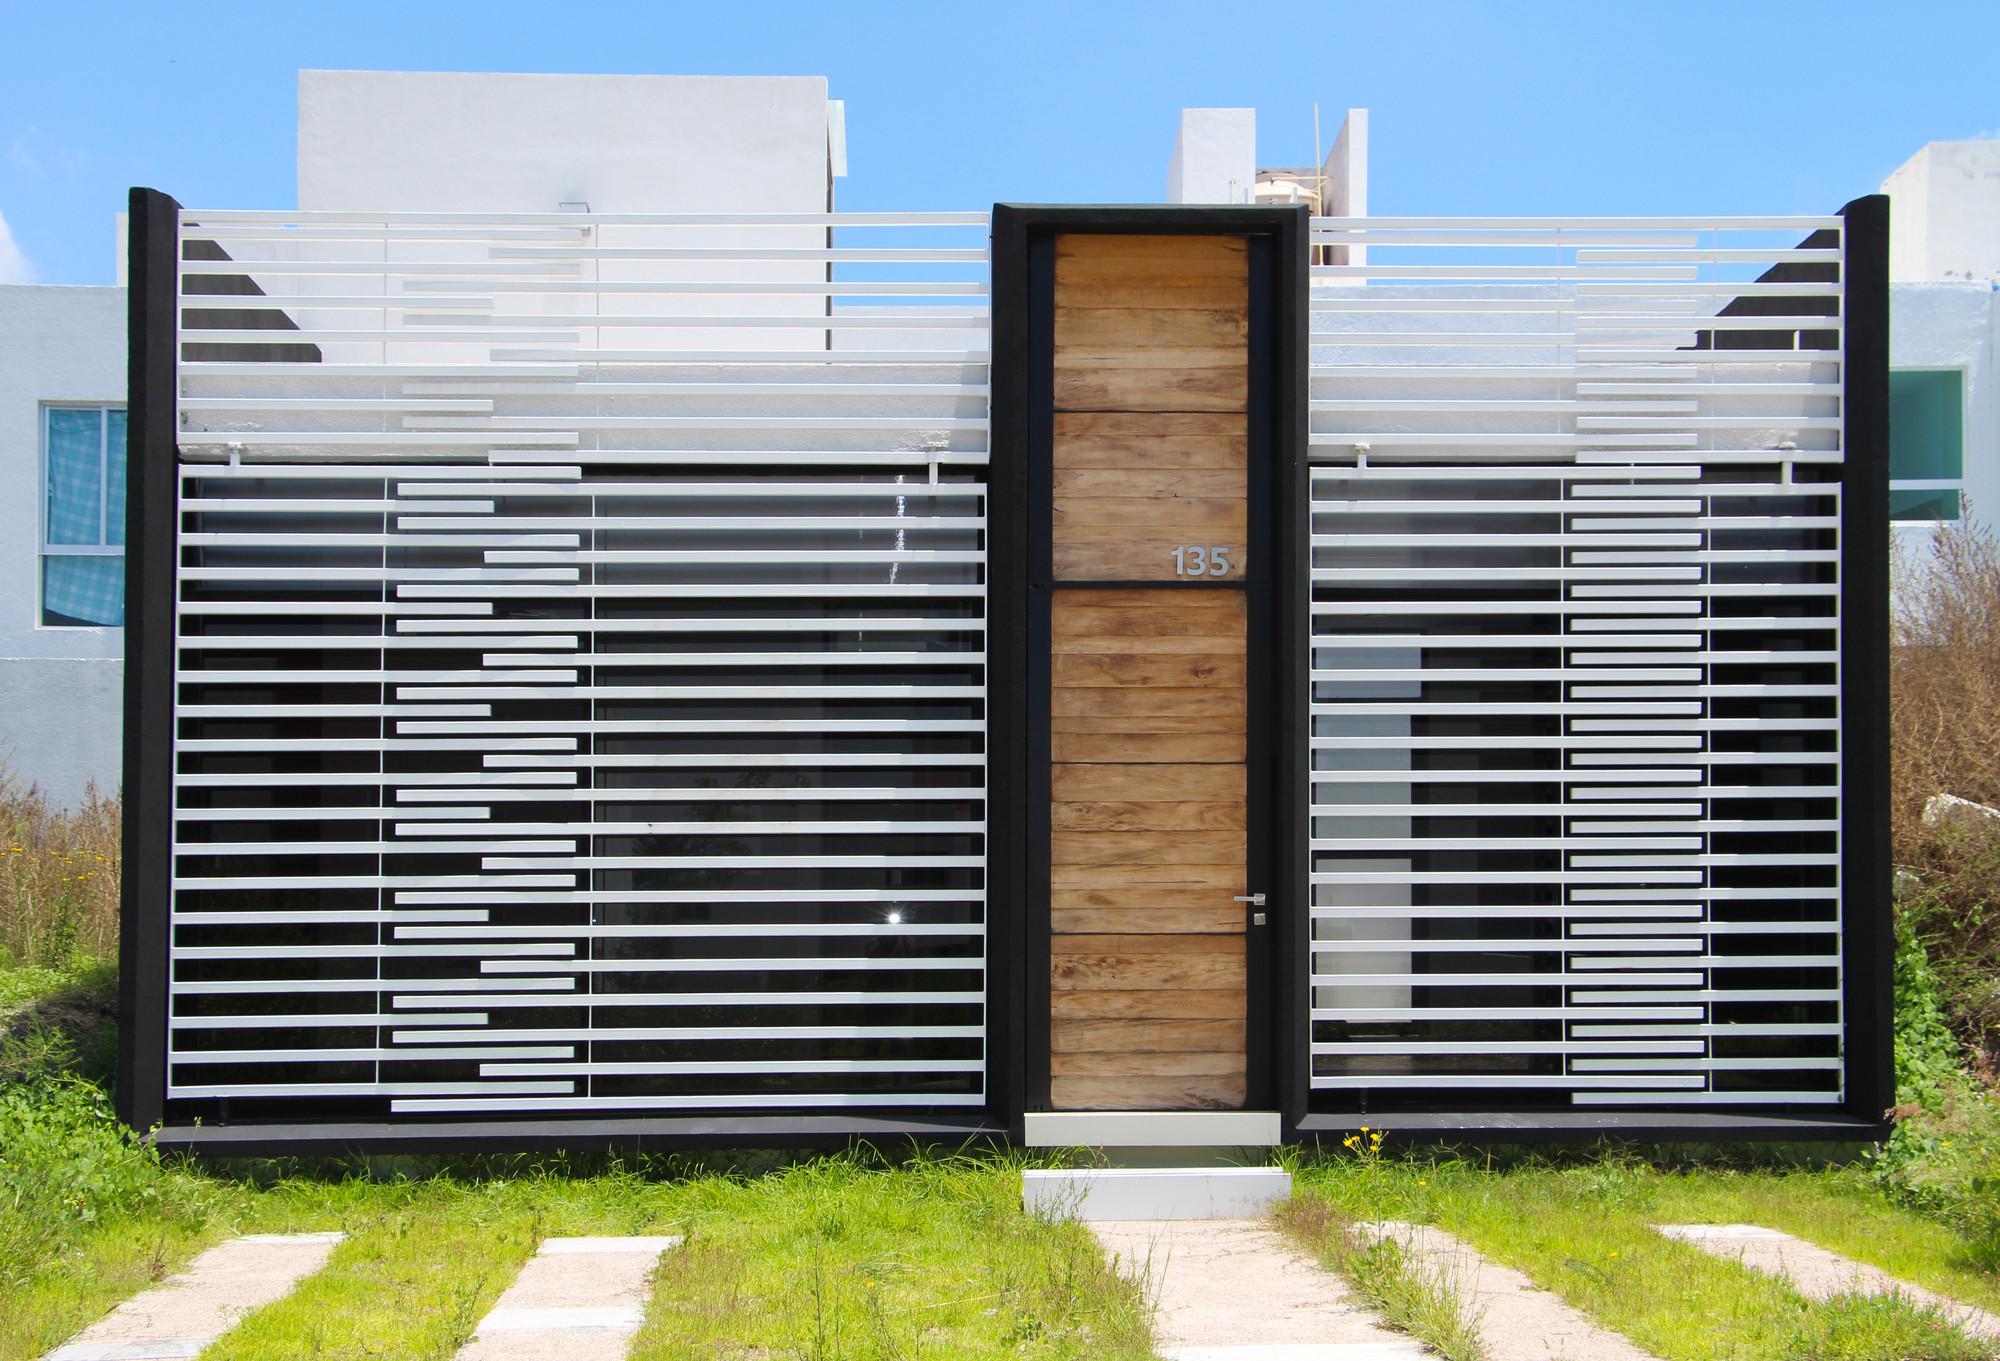 Social Green House / Darkitectura, © Julio Juárez